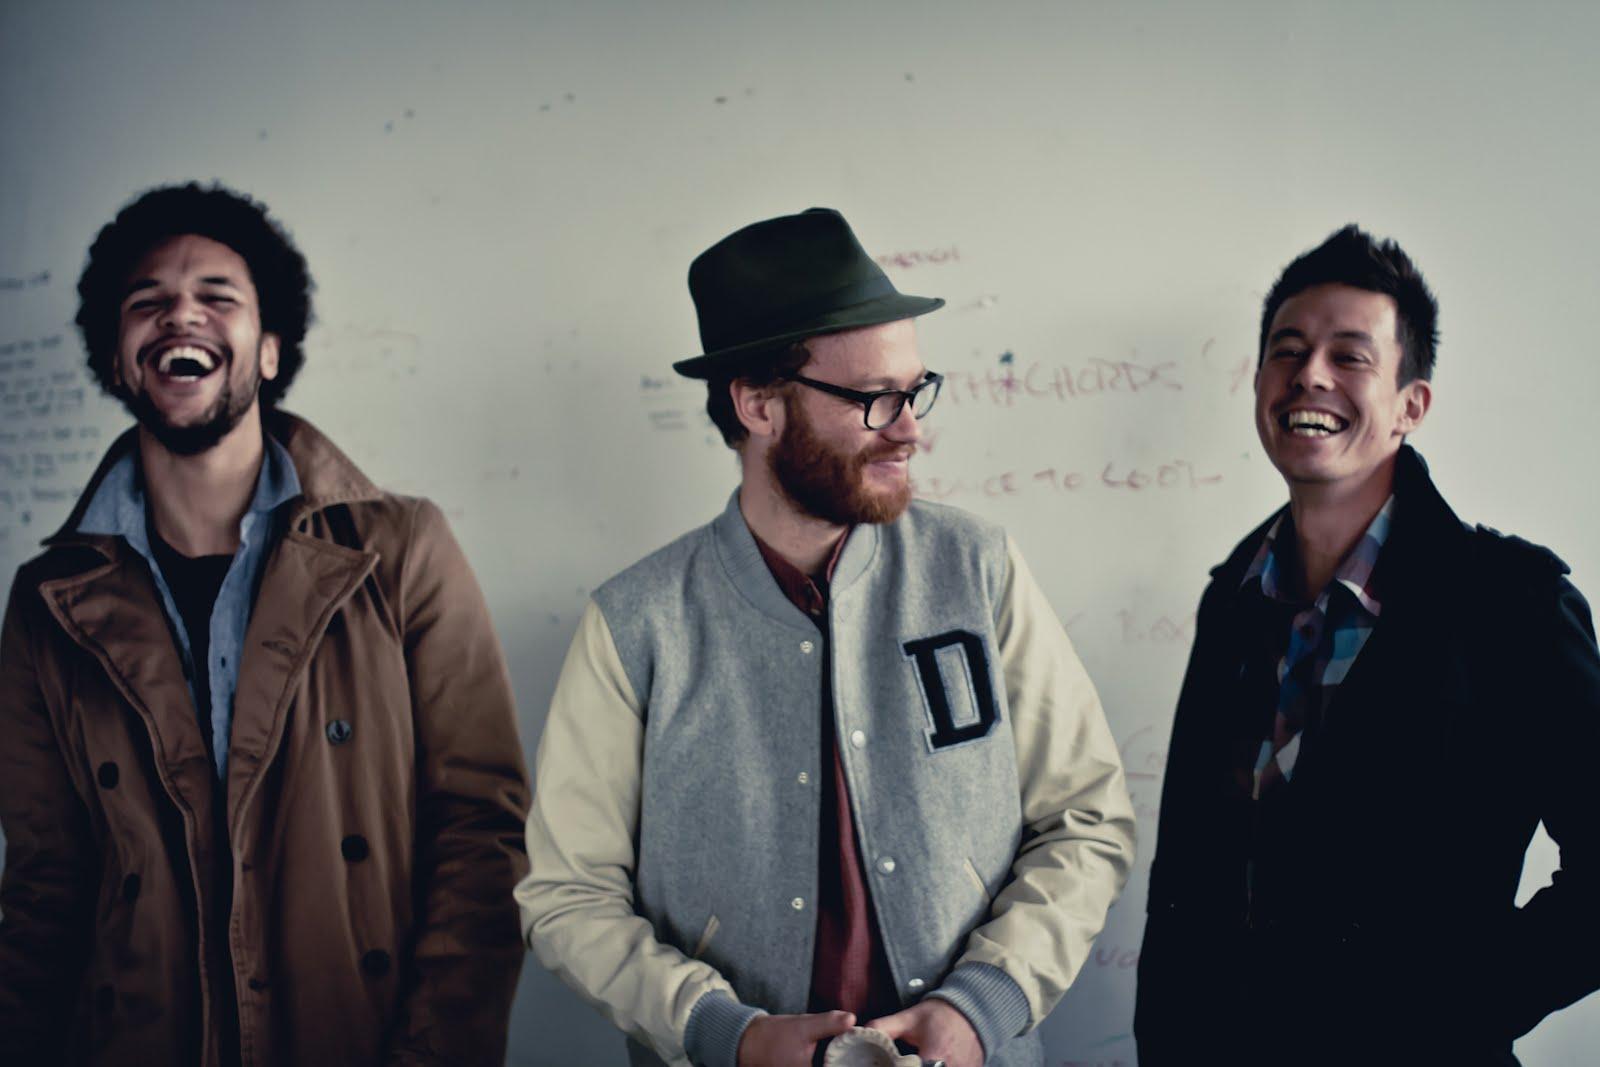 AustinBloggyLimits - An Austin Music Blog: 2/12/12 - 2/19/12